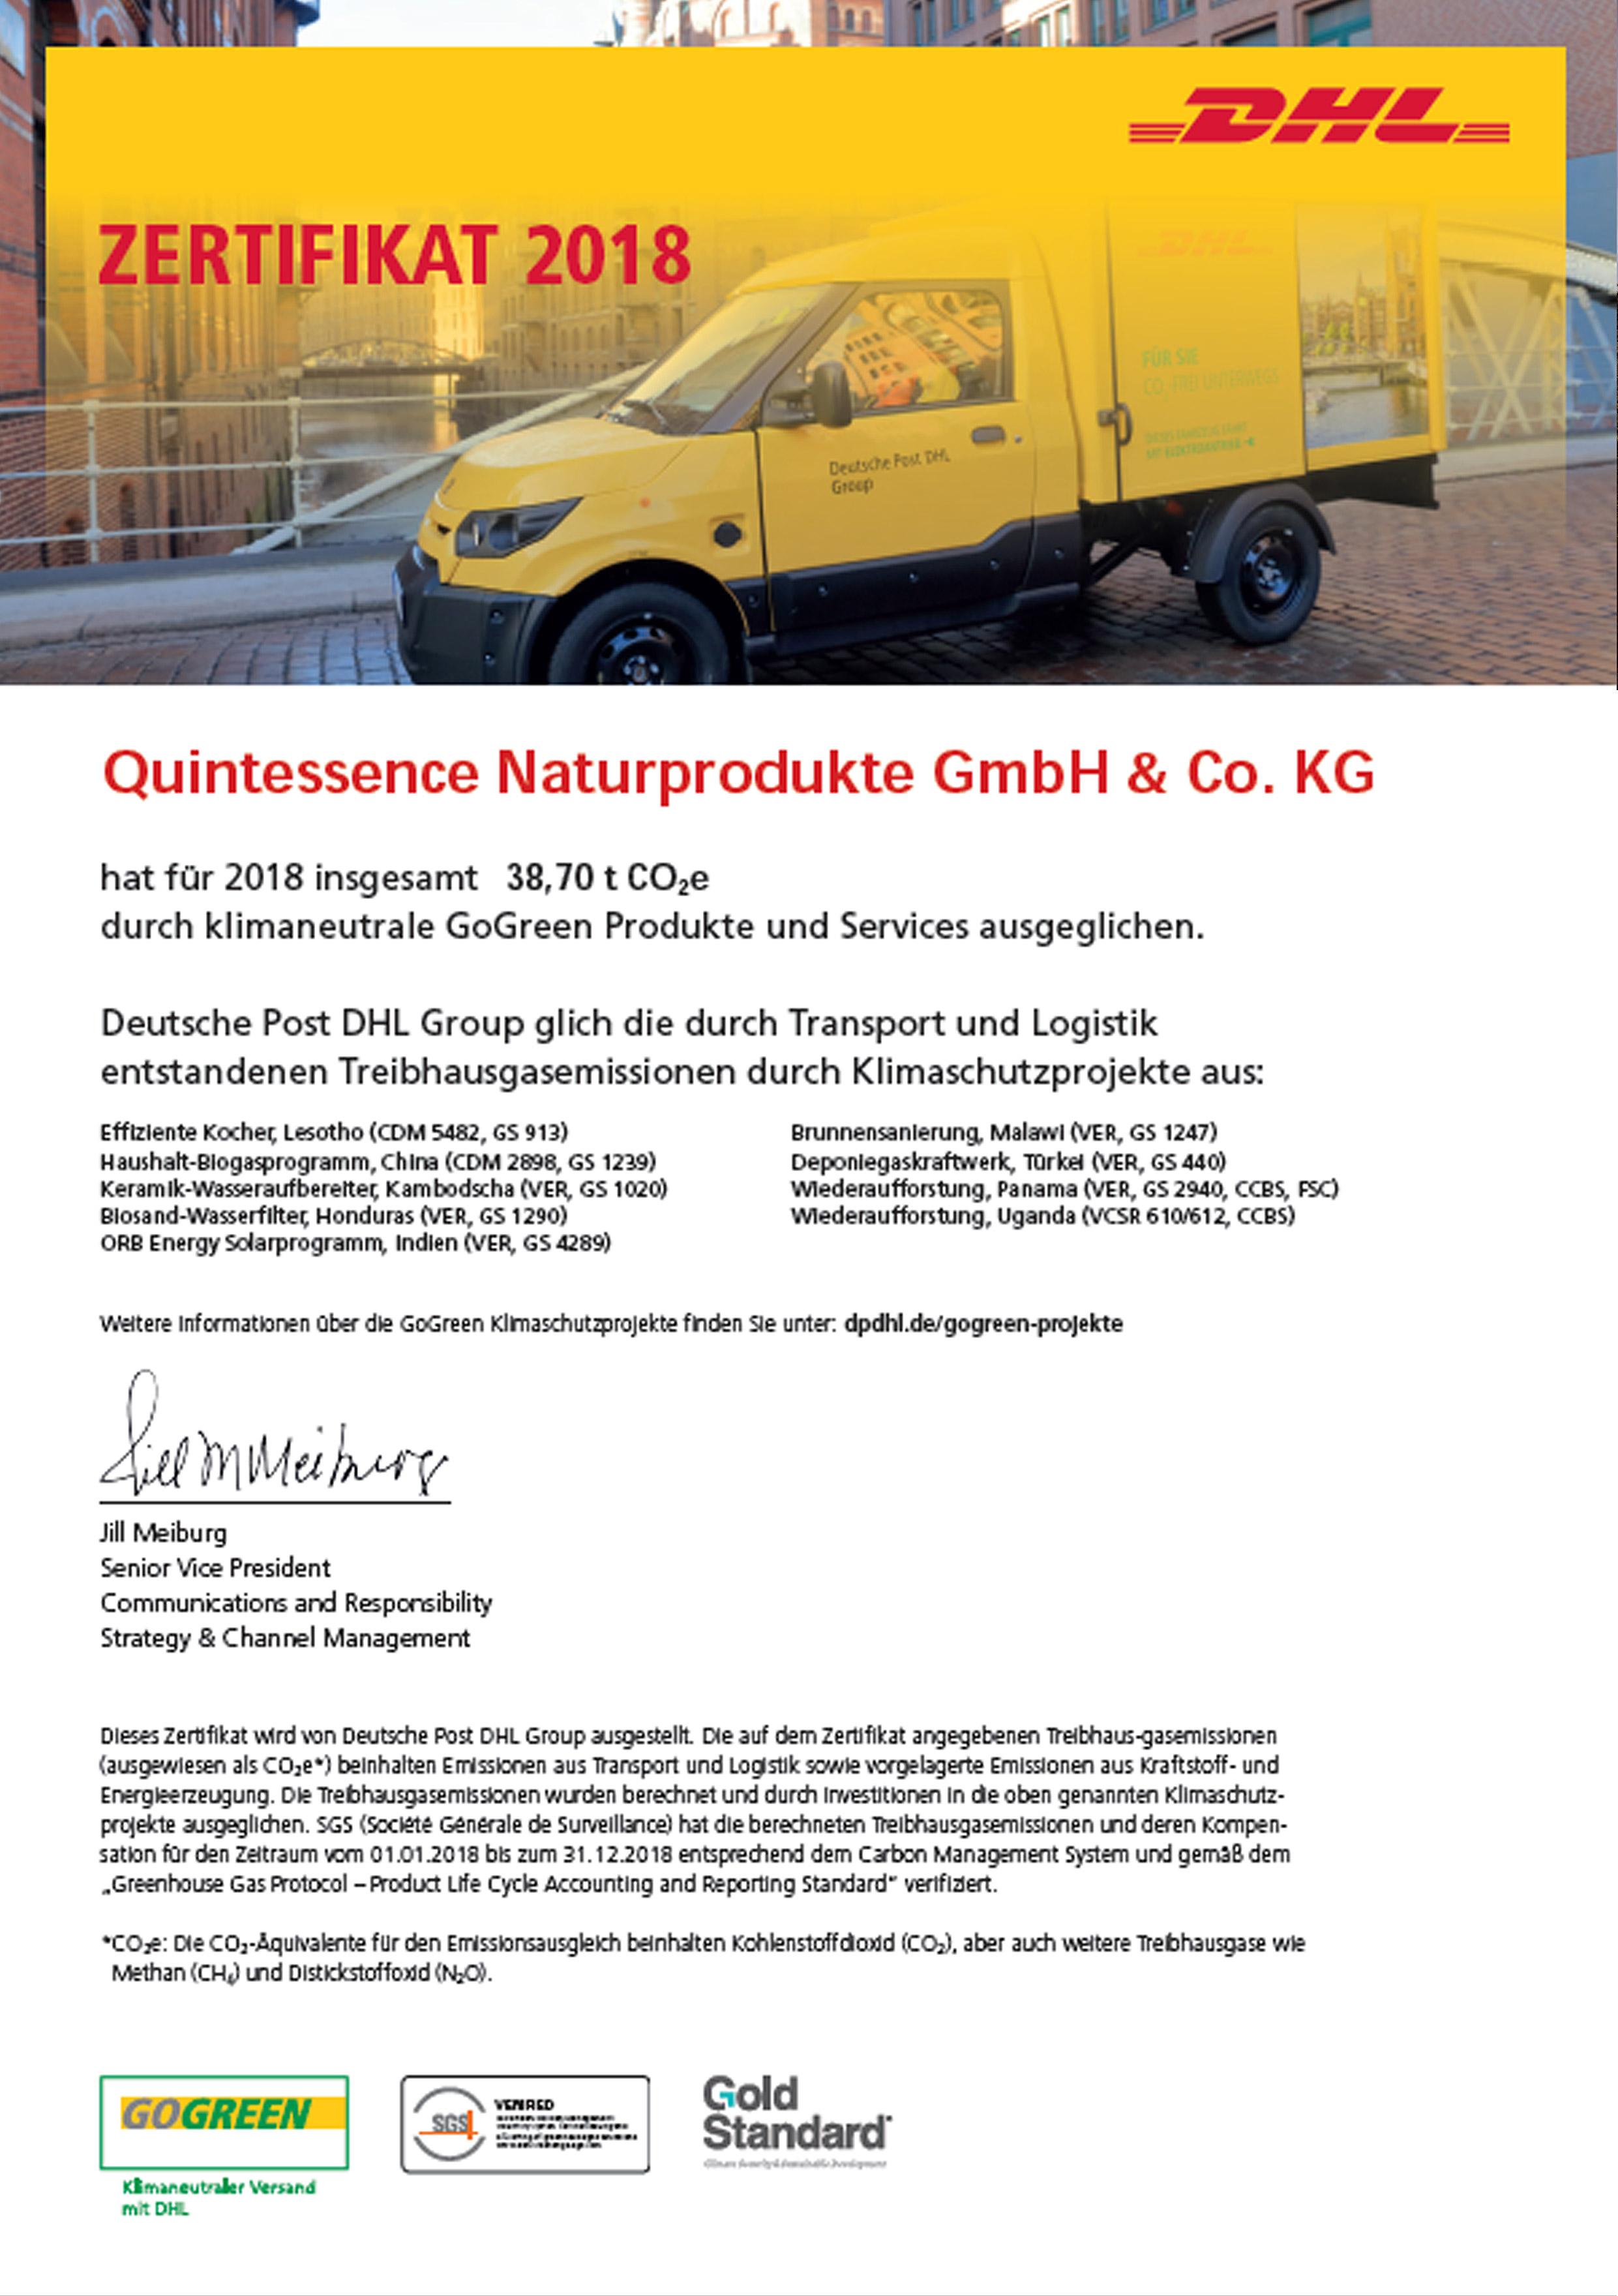 DHL-GoGreen-Zertifikat 2018